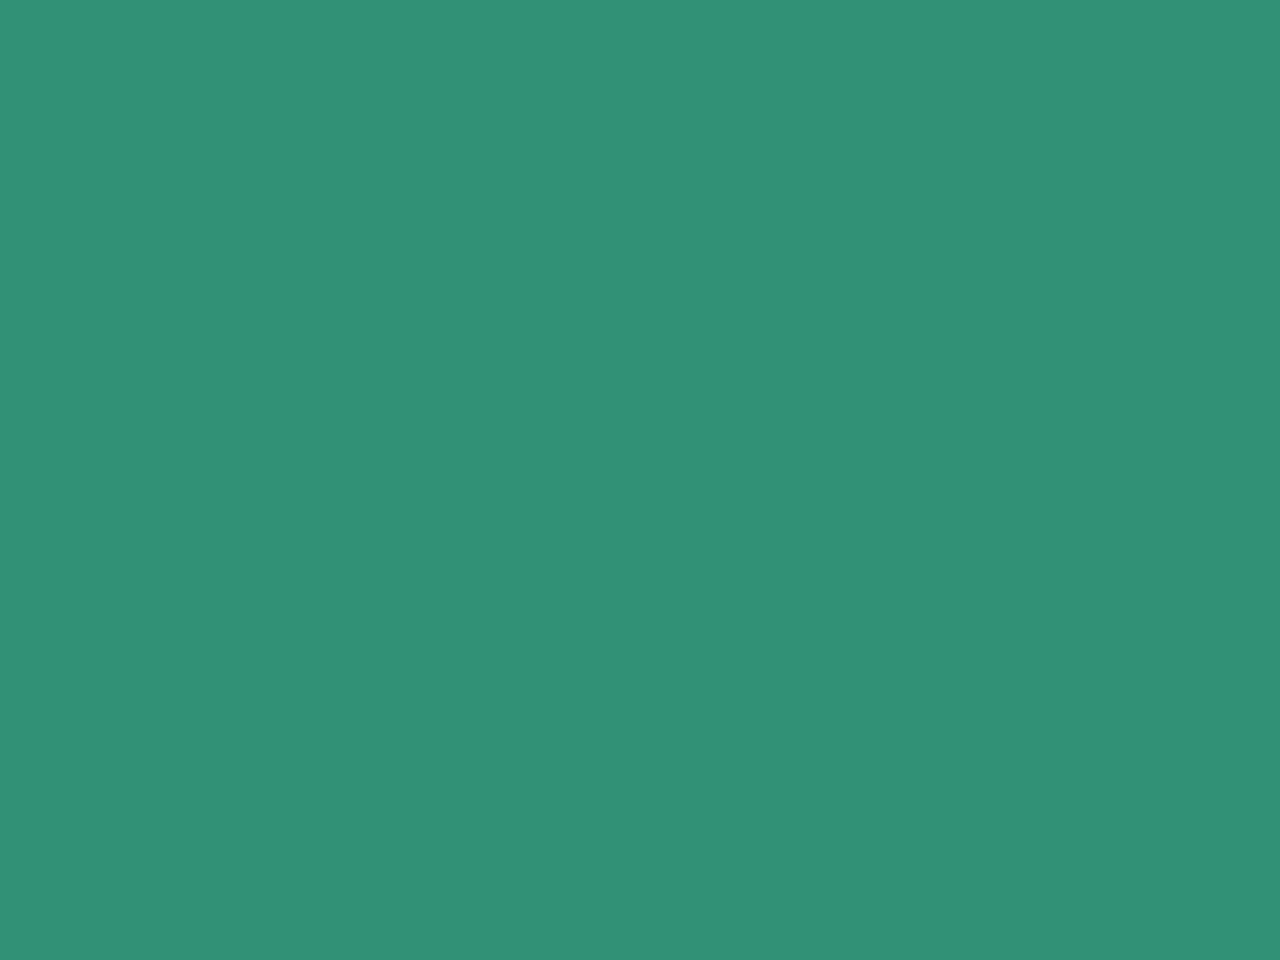 1280x960 Illuminating Emerald Solid Color Background